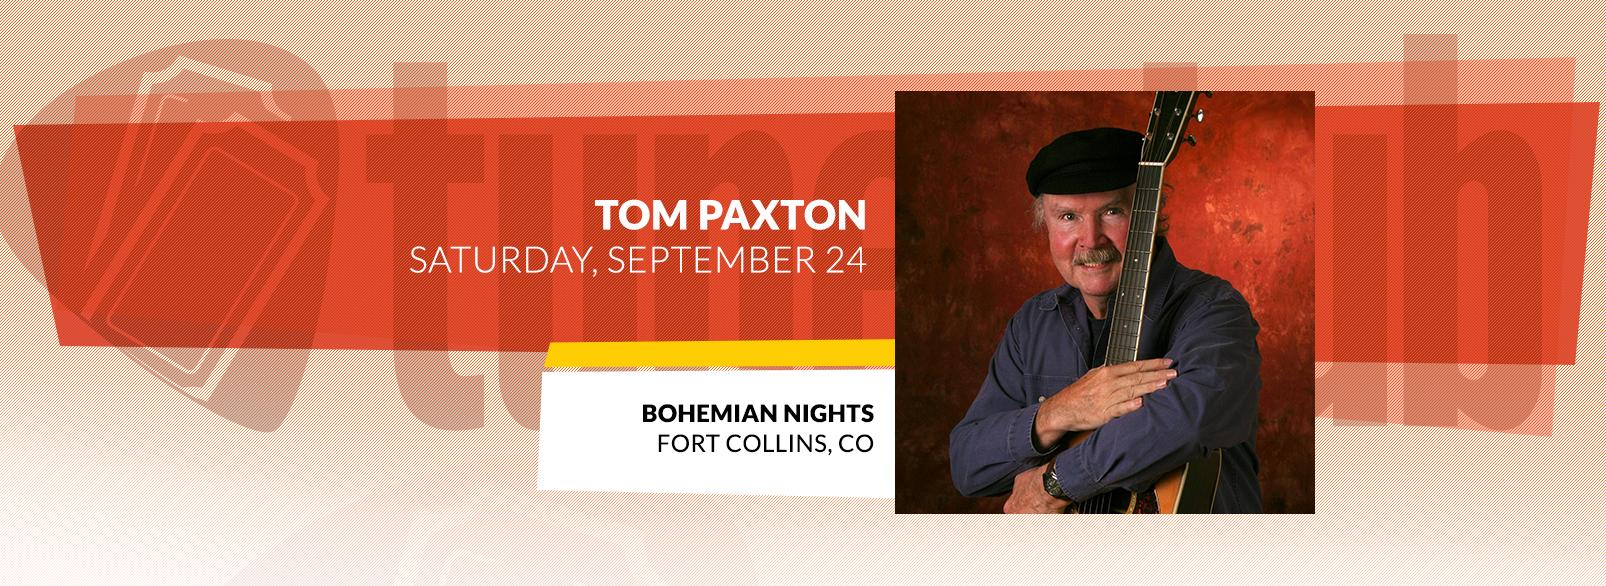 Tom Paxton @ Bohemian Nights